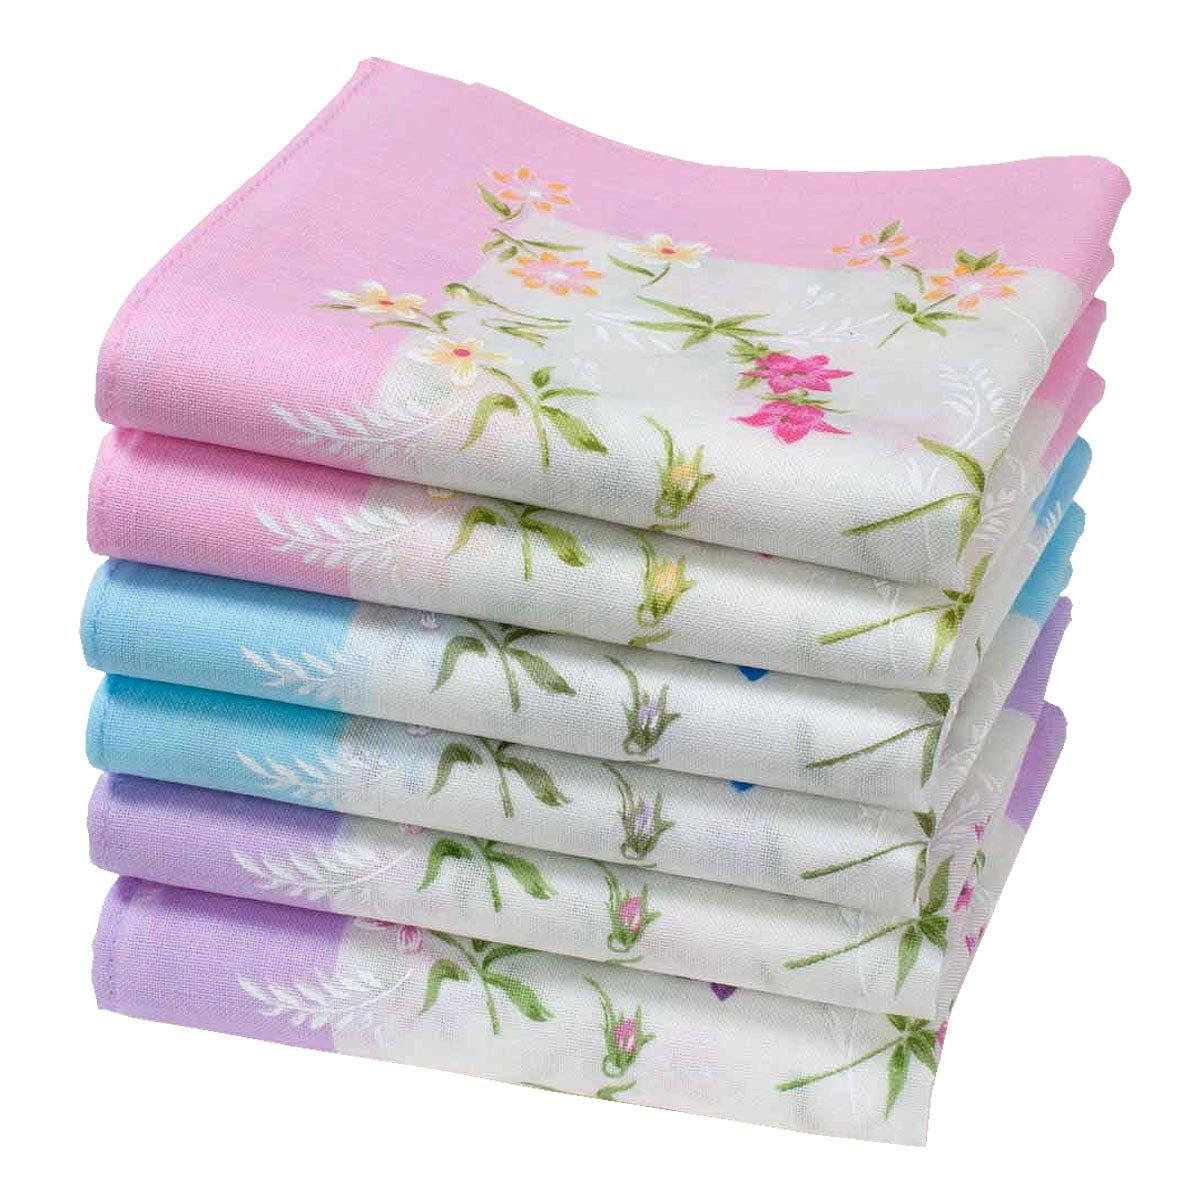 Abby handkerchiefs for ladies - 14